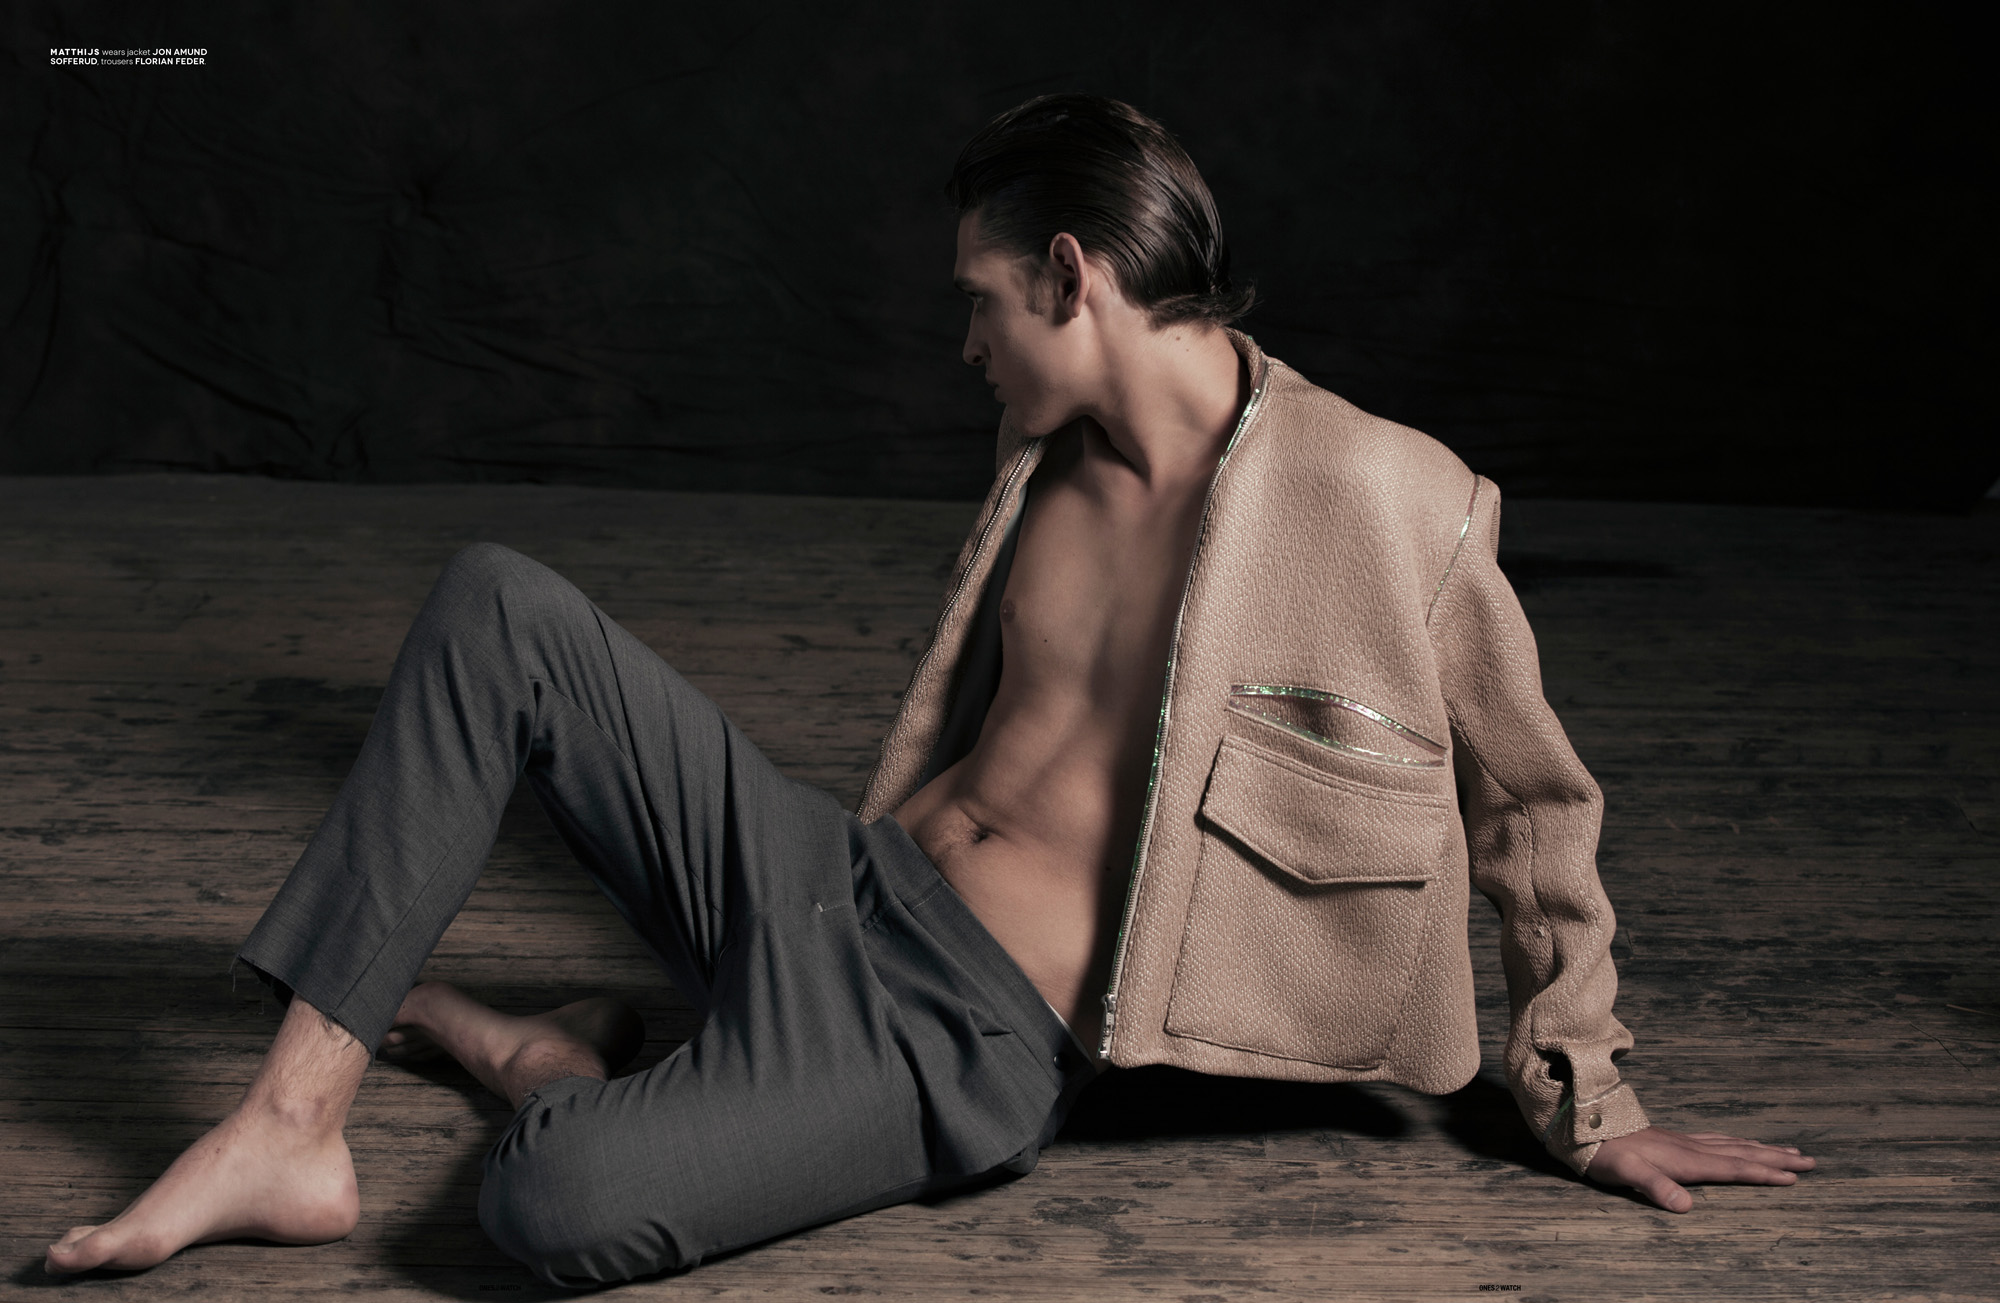 Matthijs wears jacket Jon Amund Sofferud, trousers Florian Feder.